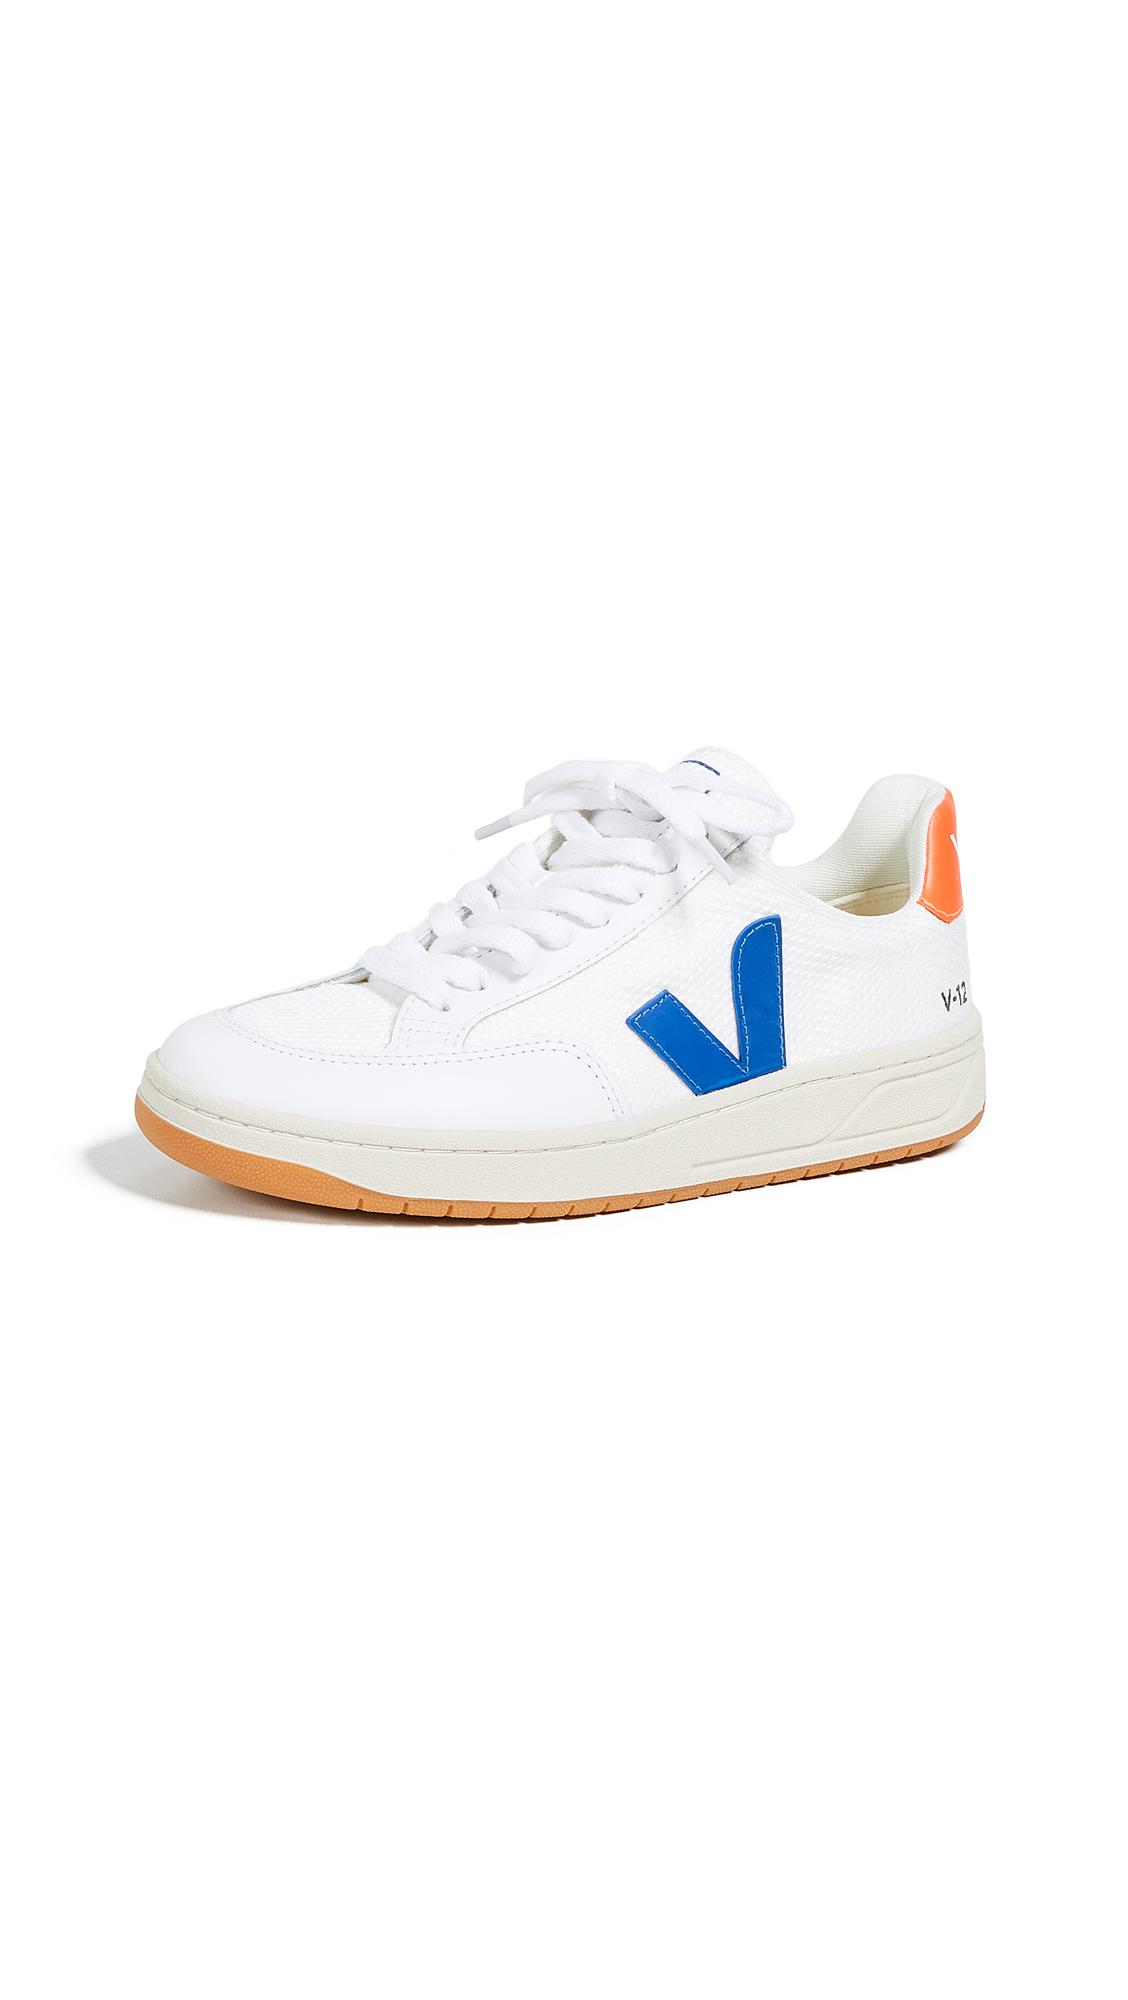 Veja V-12 Lace Up Sneakers